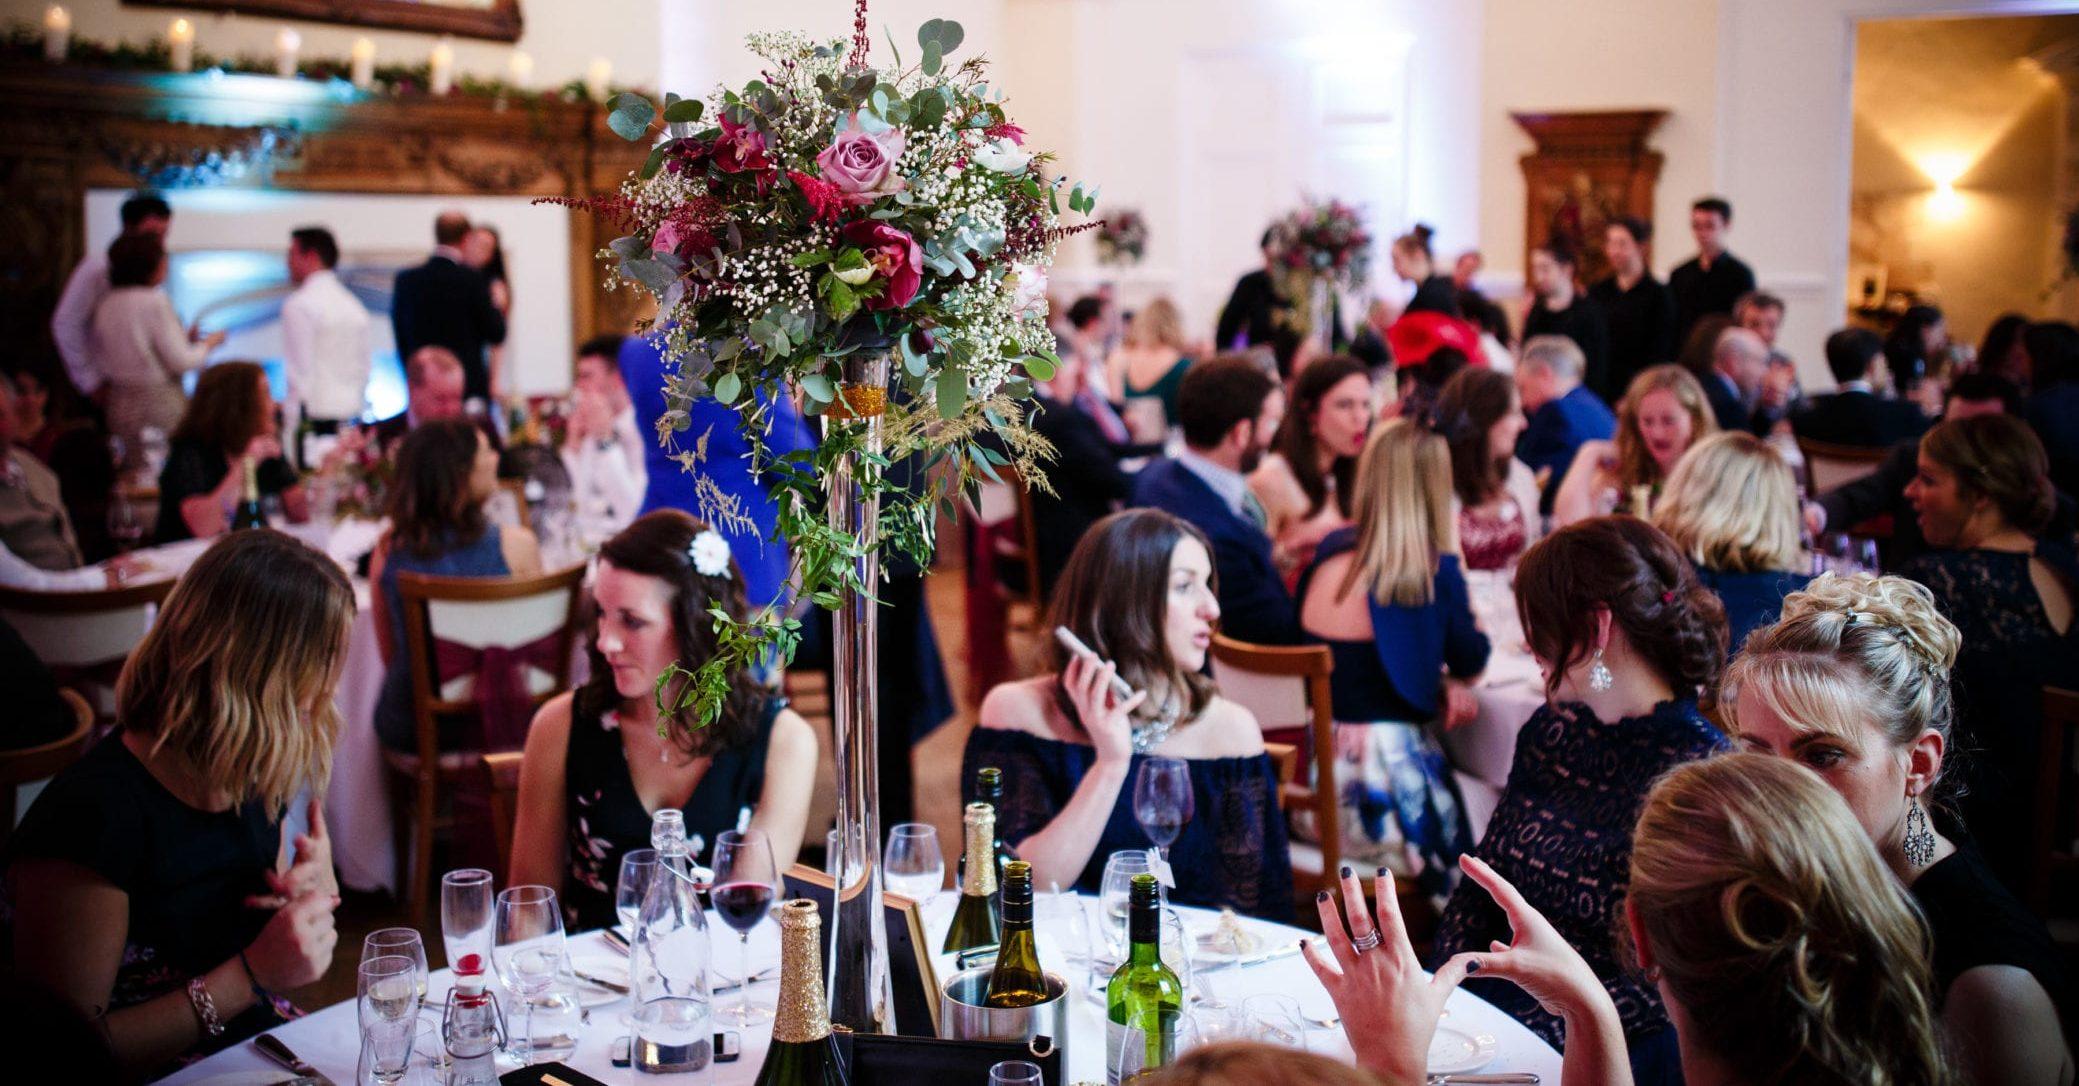 Large parties at Farnham Castle in Surrey